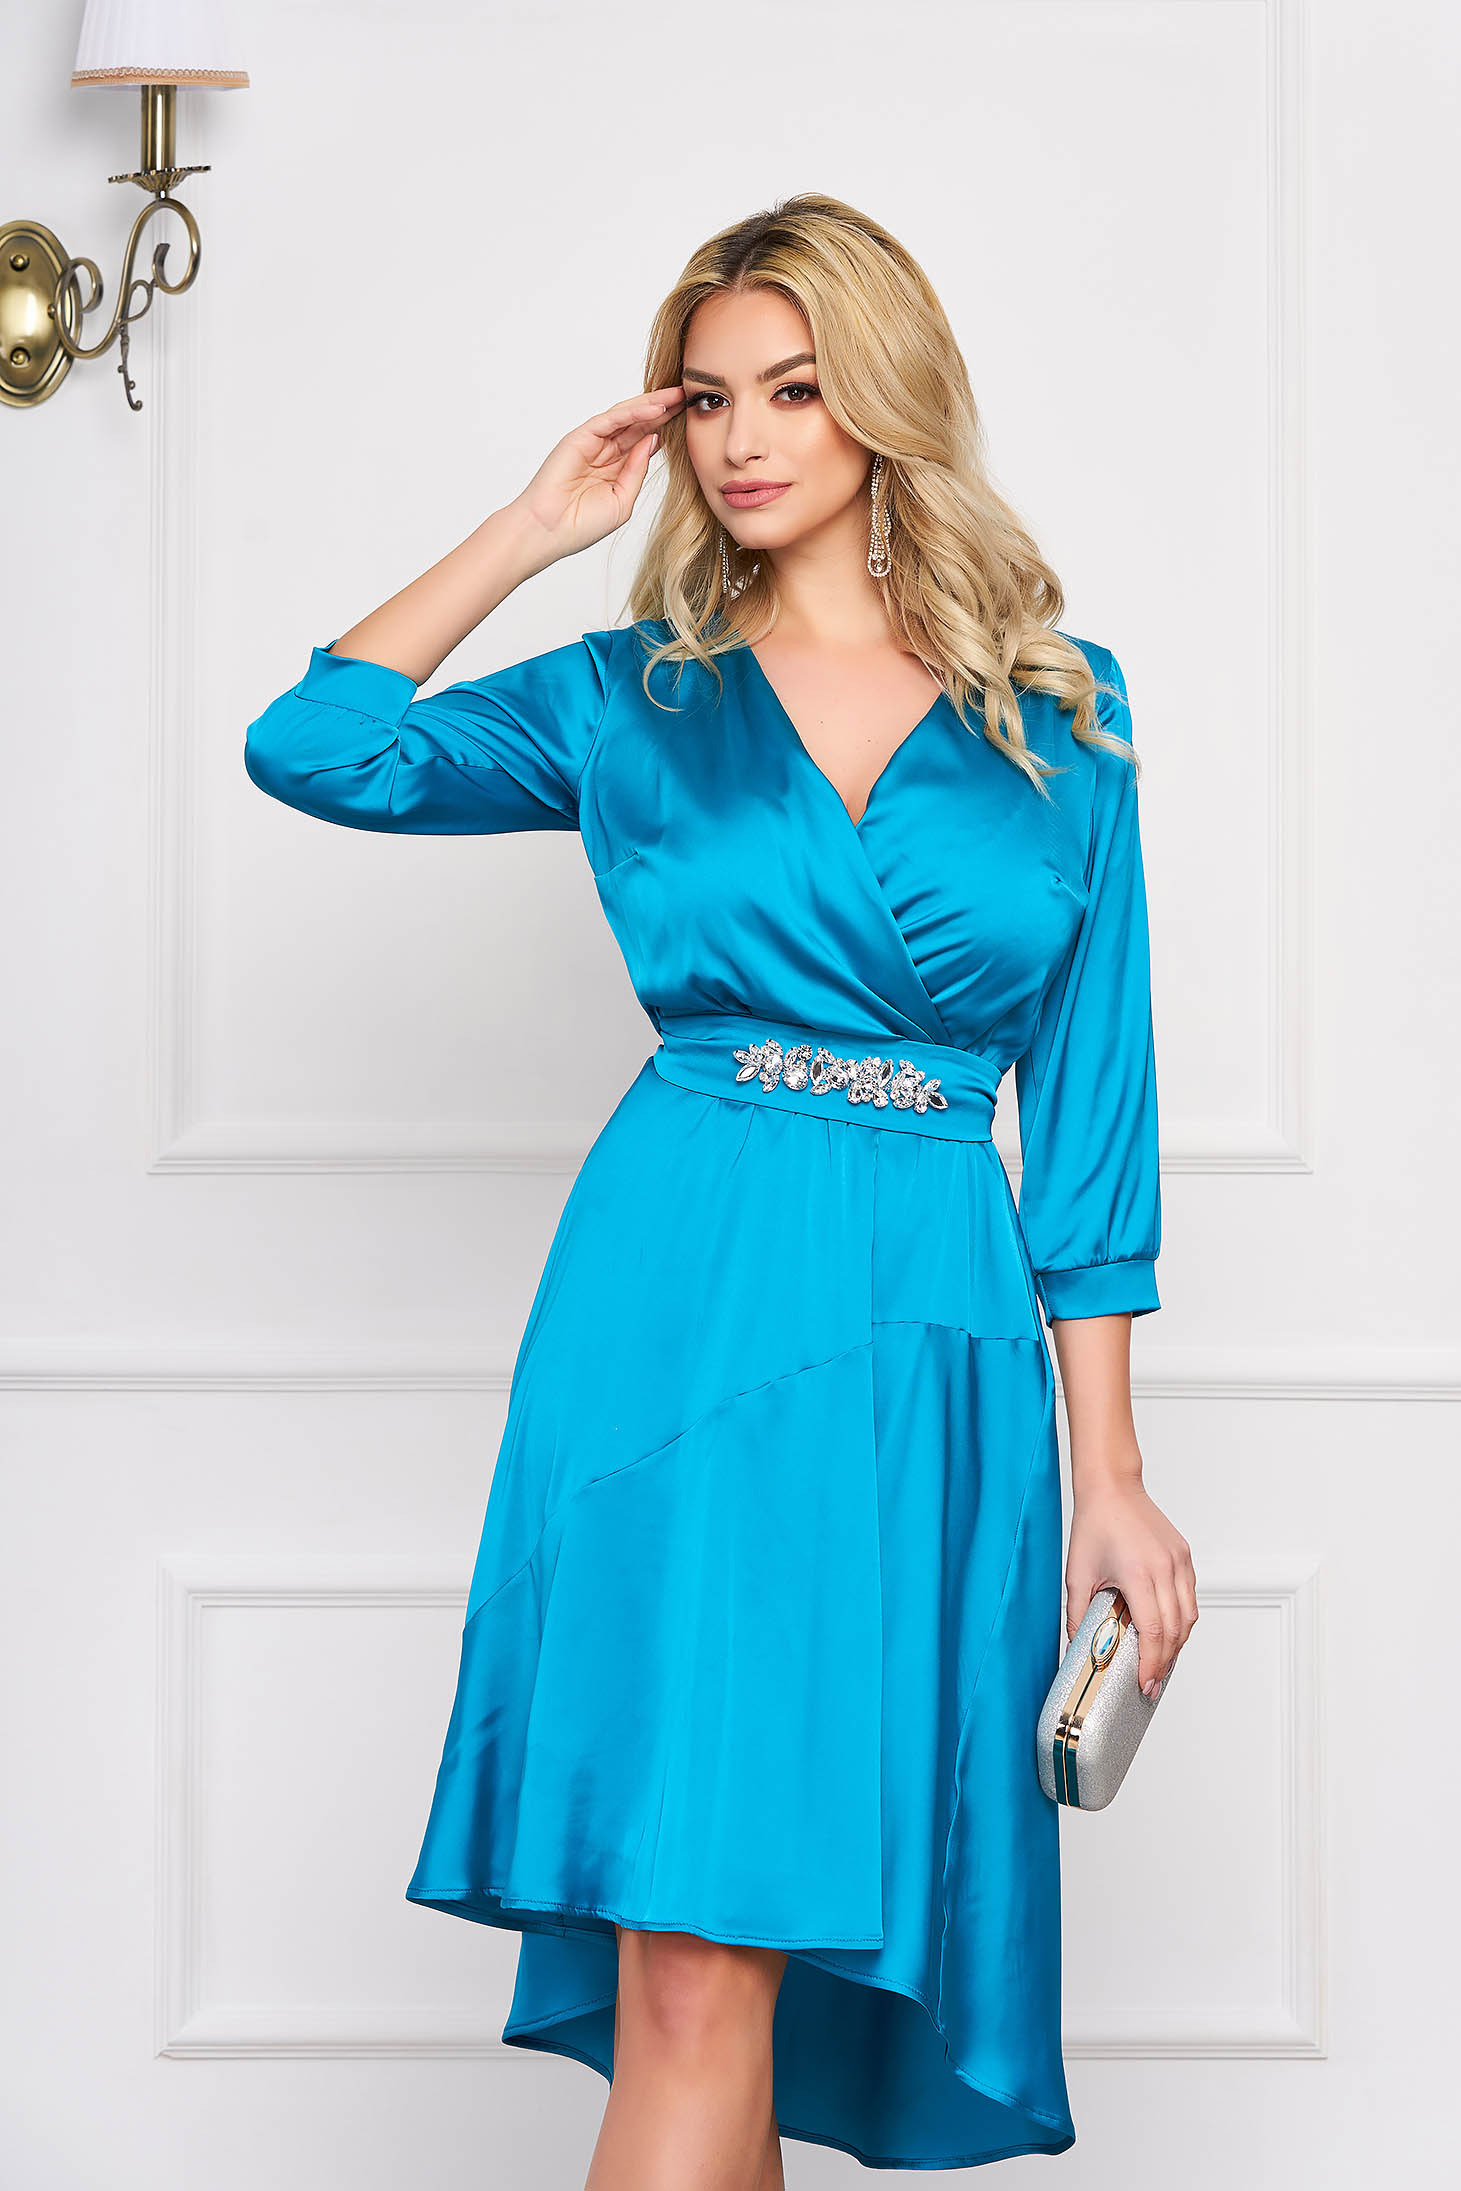 Dress turquoise StarShinerS